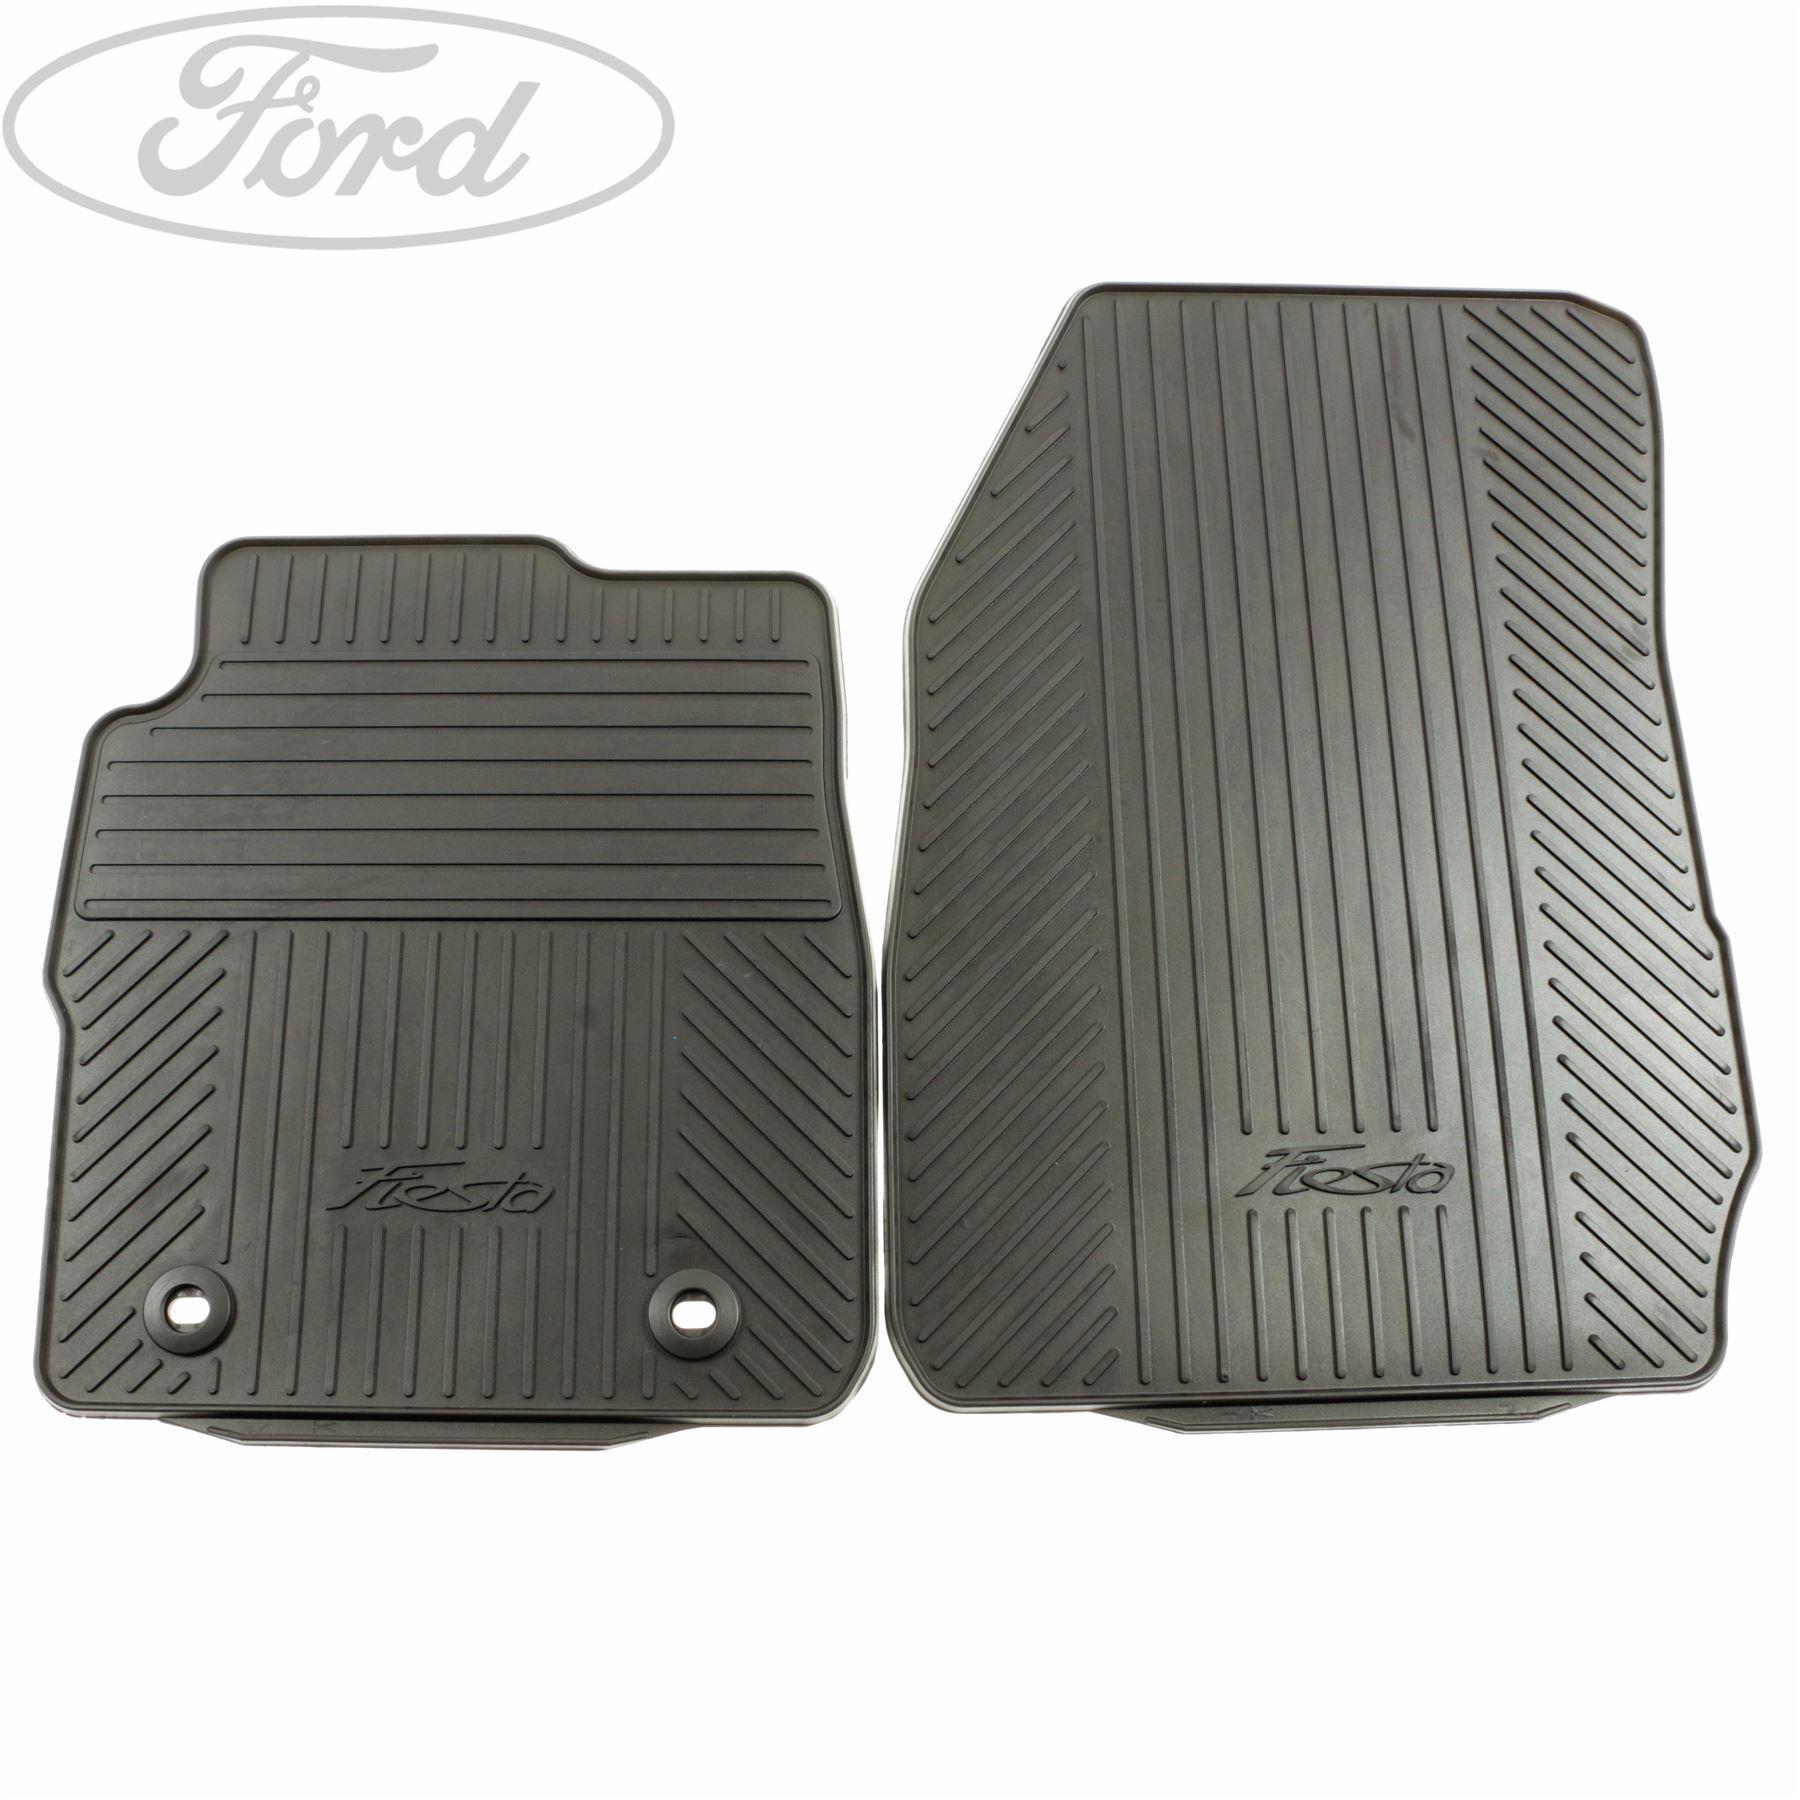 Genuine Ford Fiesta Front Contour Rubber Floor Mat Set